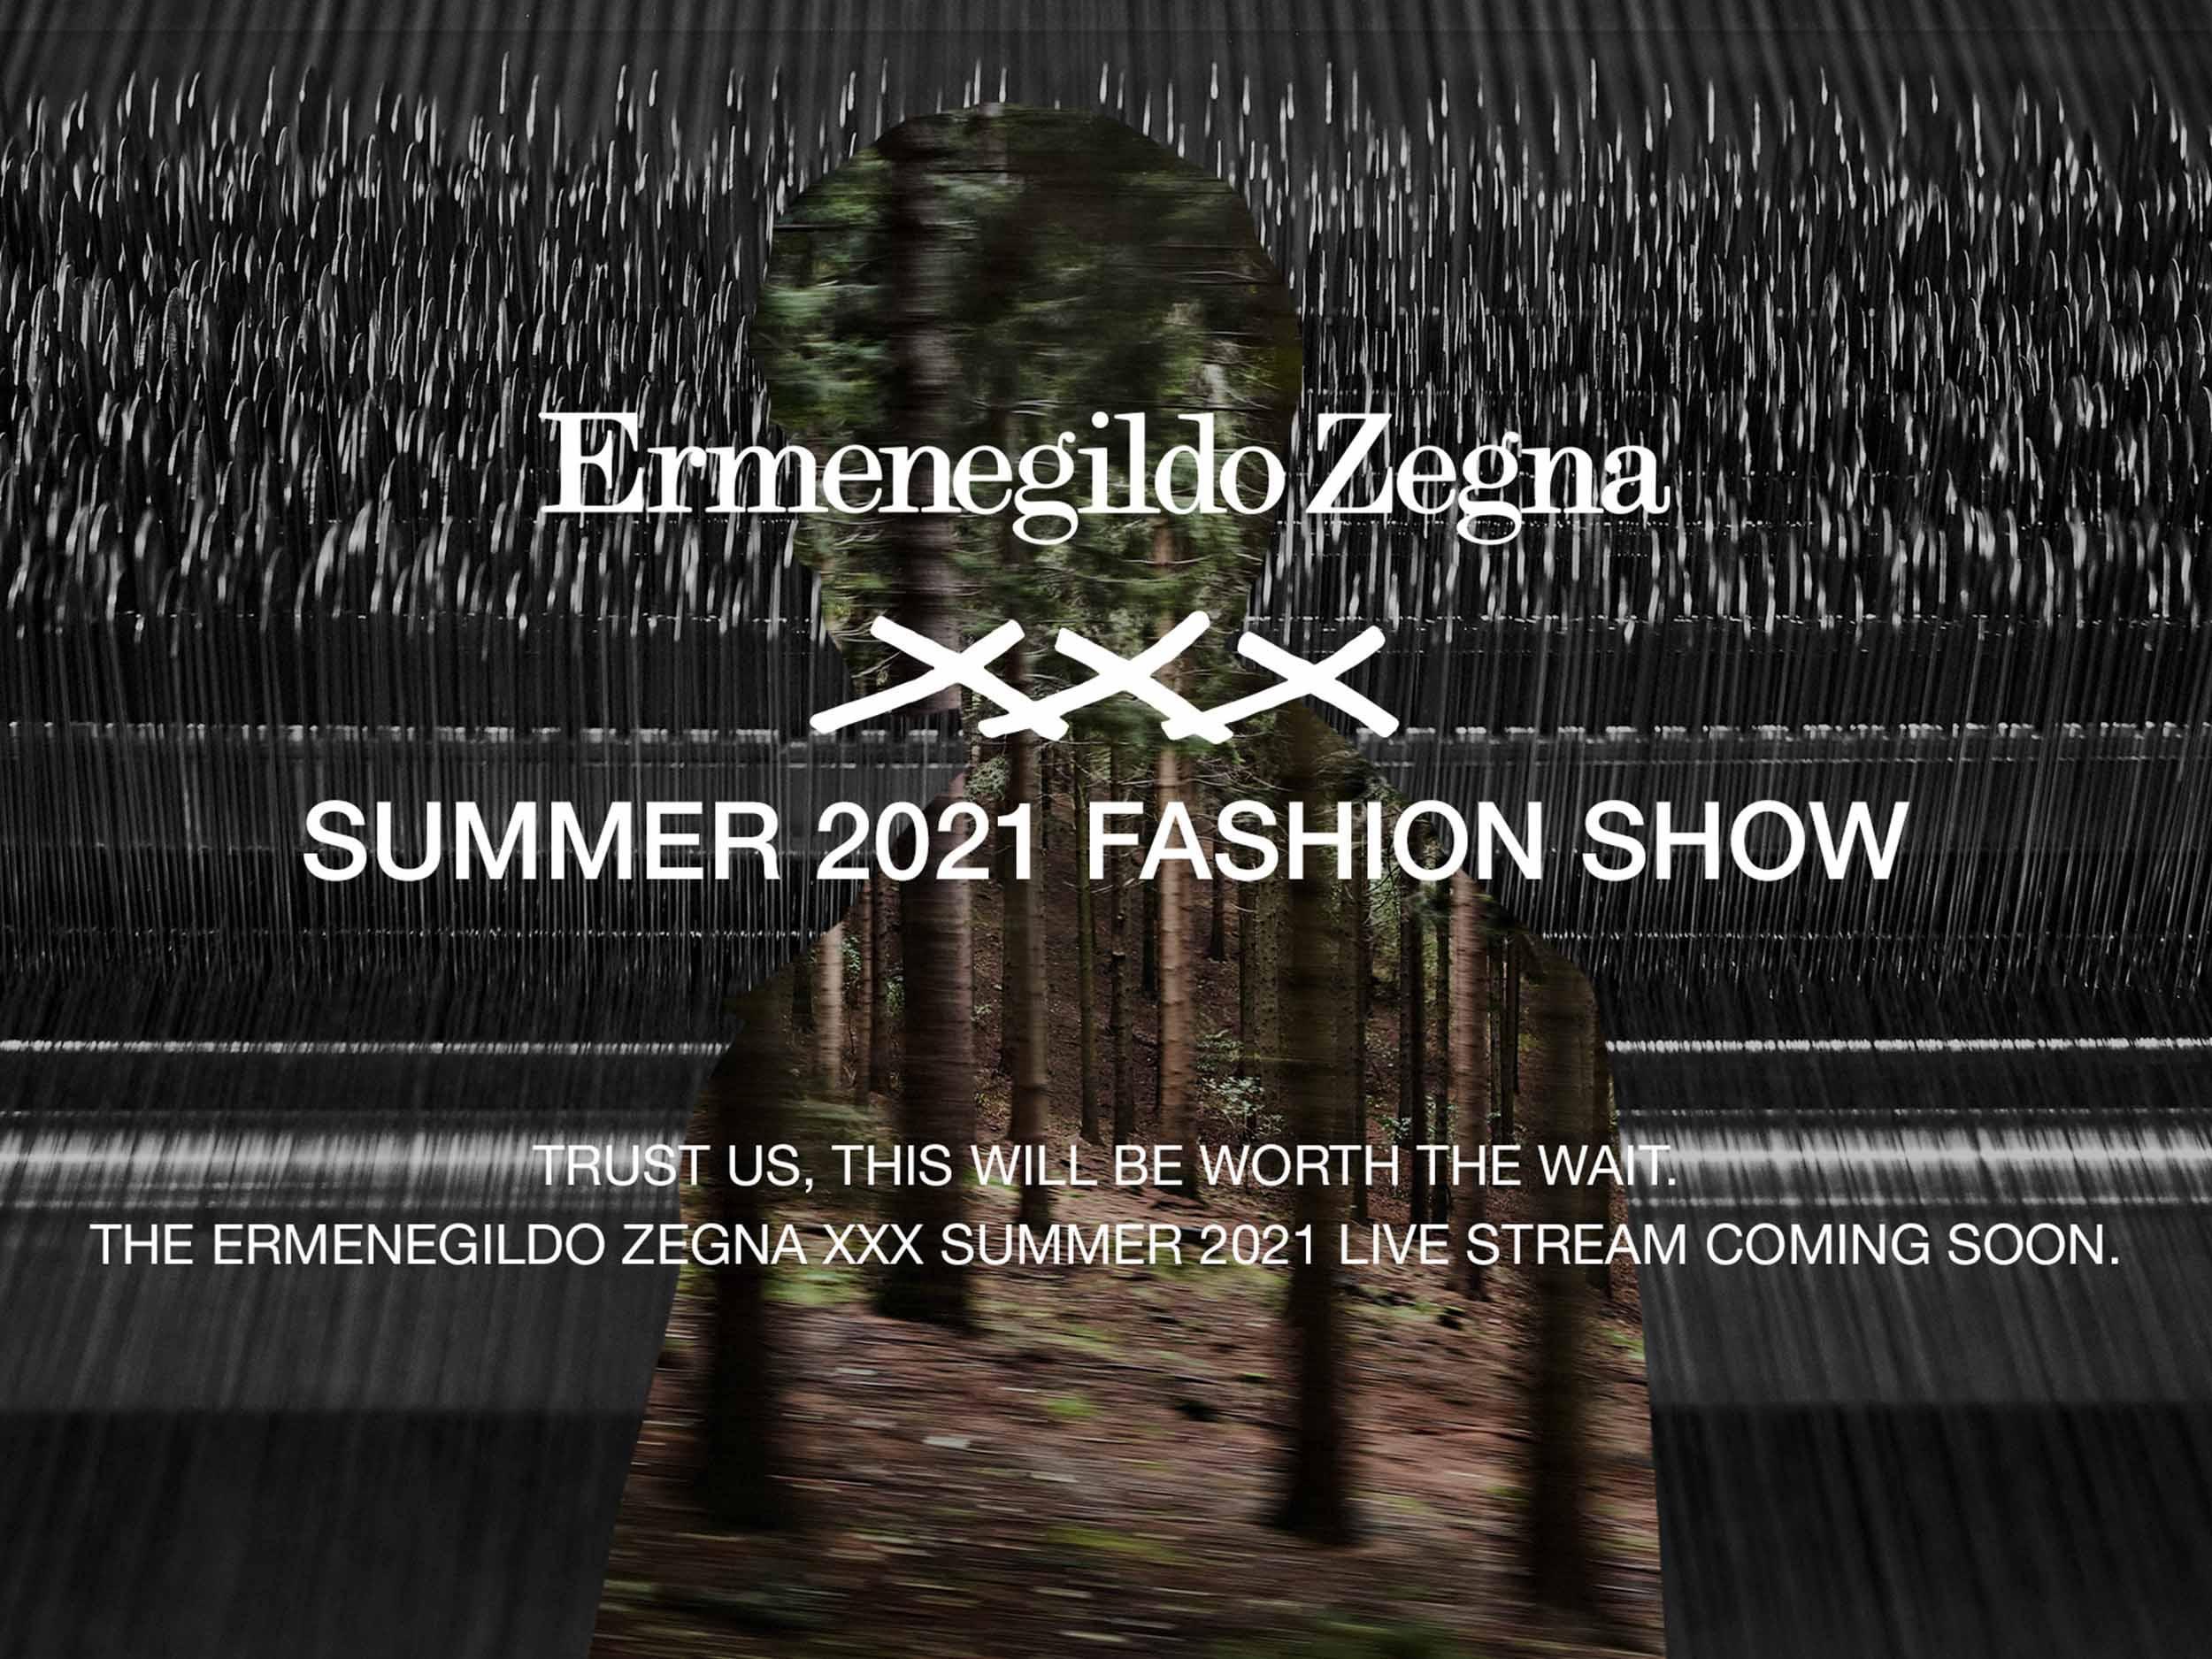 Watch live: Ermenegildo Zegna XXX Spring/Summer 2021 presentation